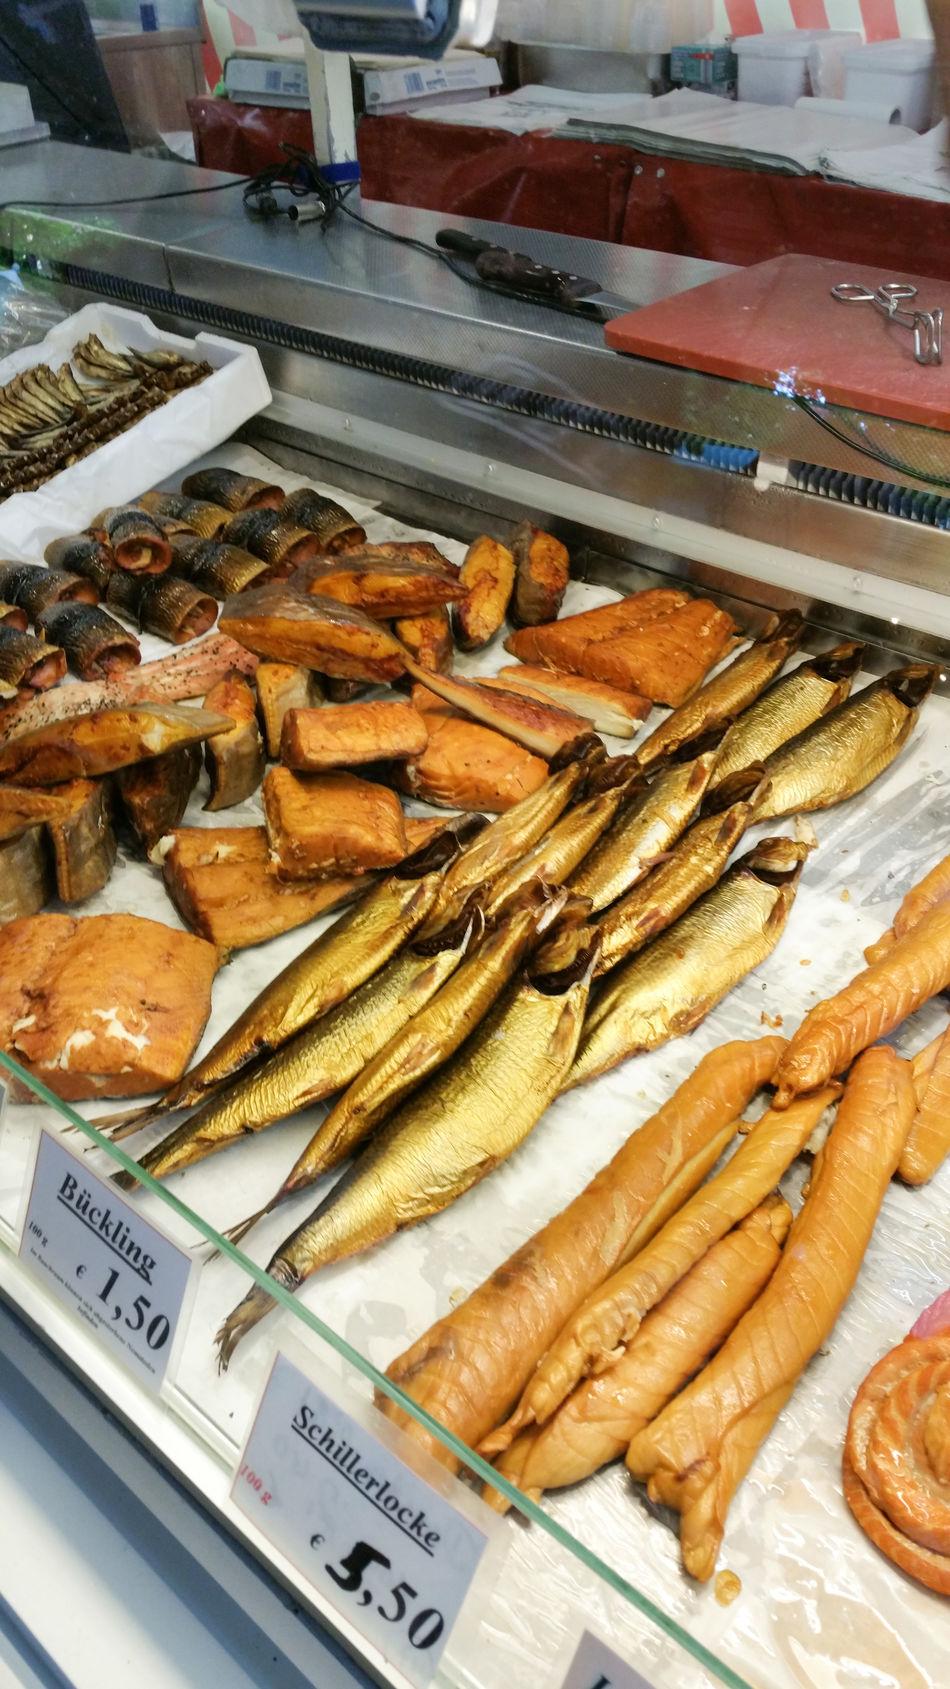 Bückling Dogfish Escolar Fish Fish Market Fishes Halibut HalibutFillet Kipper Oilfish Schillerlocken Smoked Smoked Dogfish Smoked Herring Smoked Salmon  Stuttgart